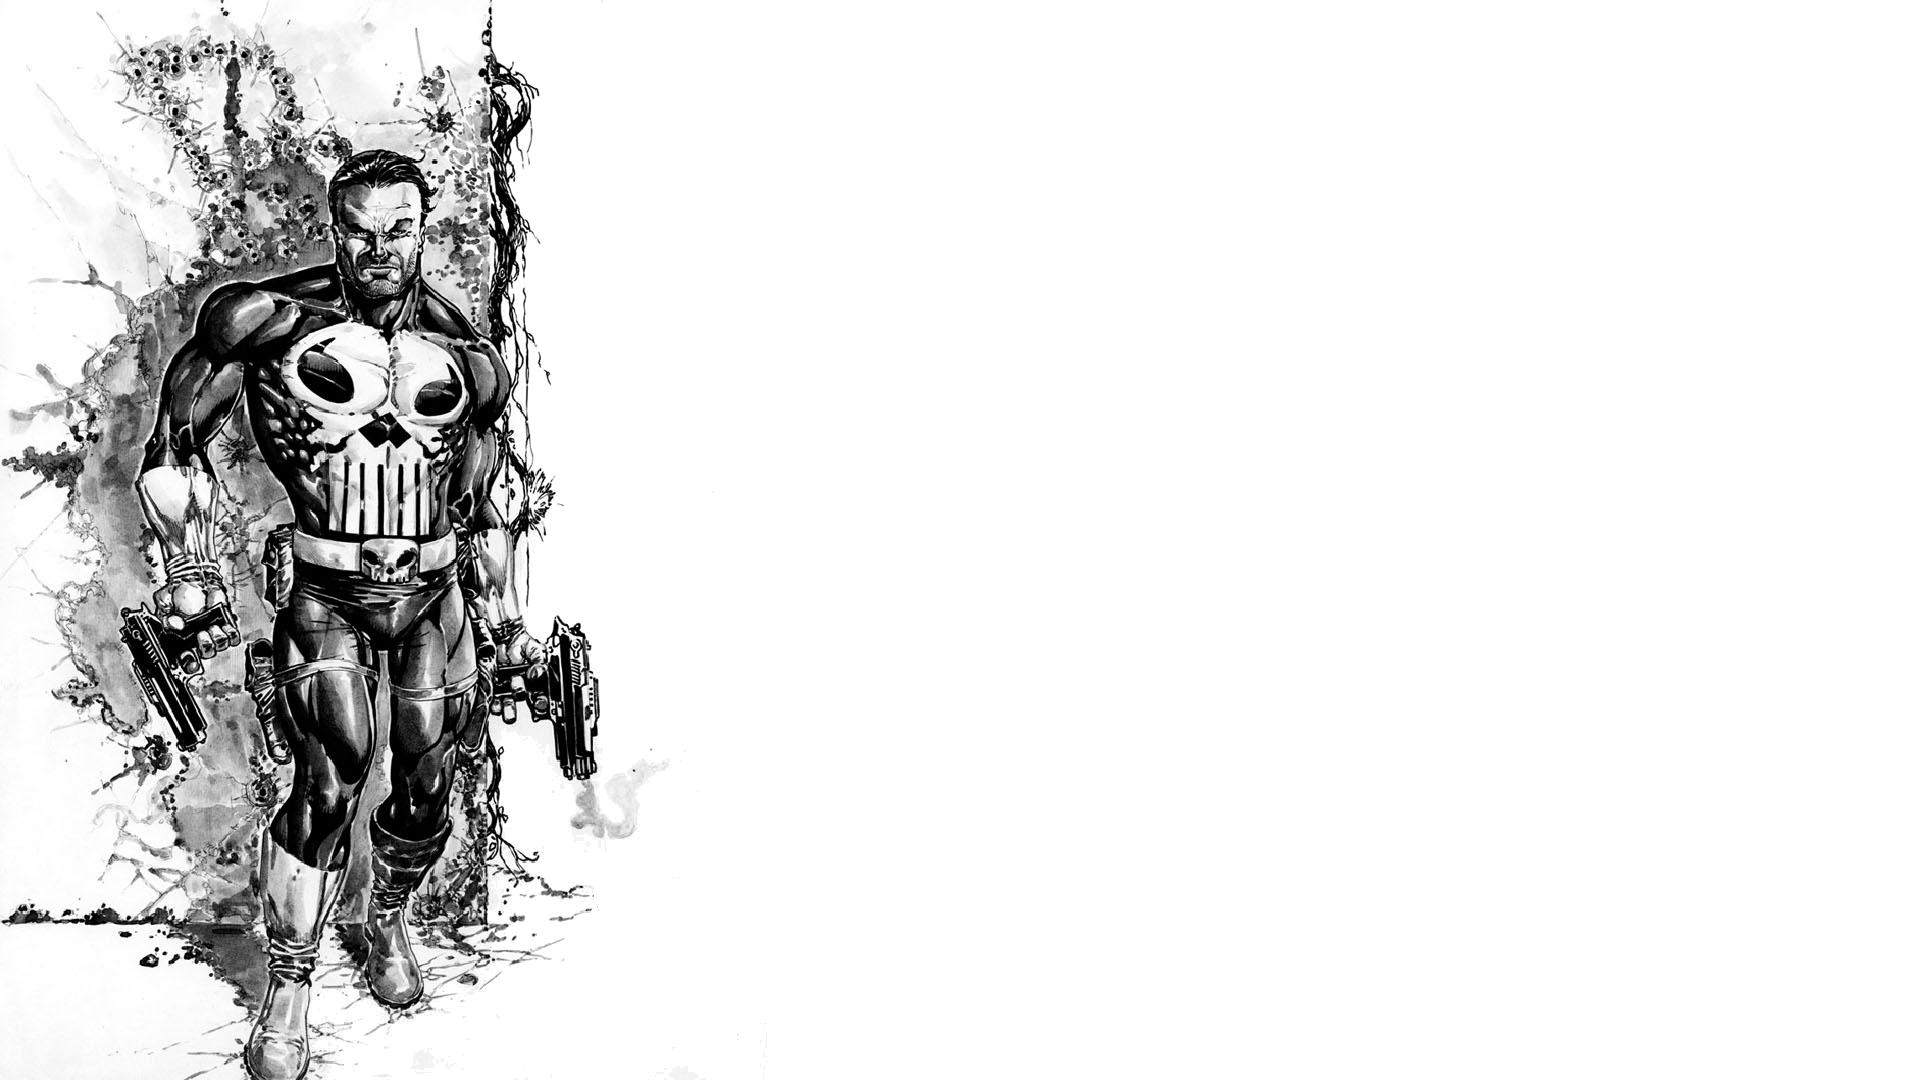 Punisher Skull Hd Wallpaper Punisher Full Hd Wallpaper And Background Image